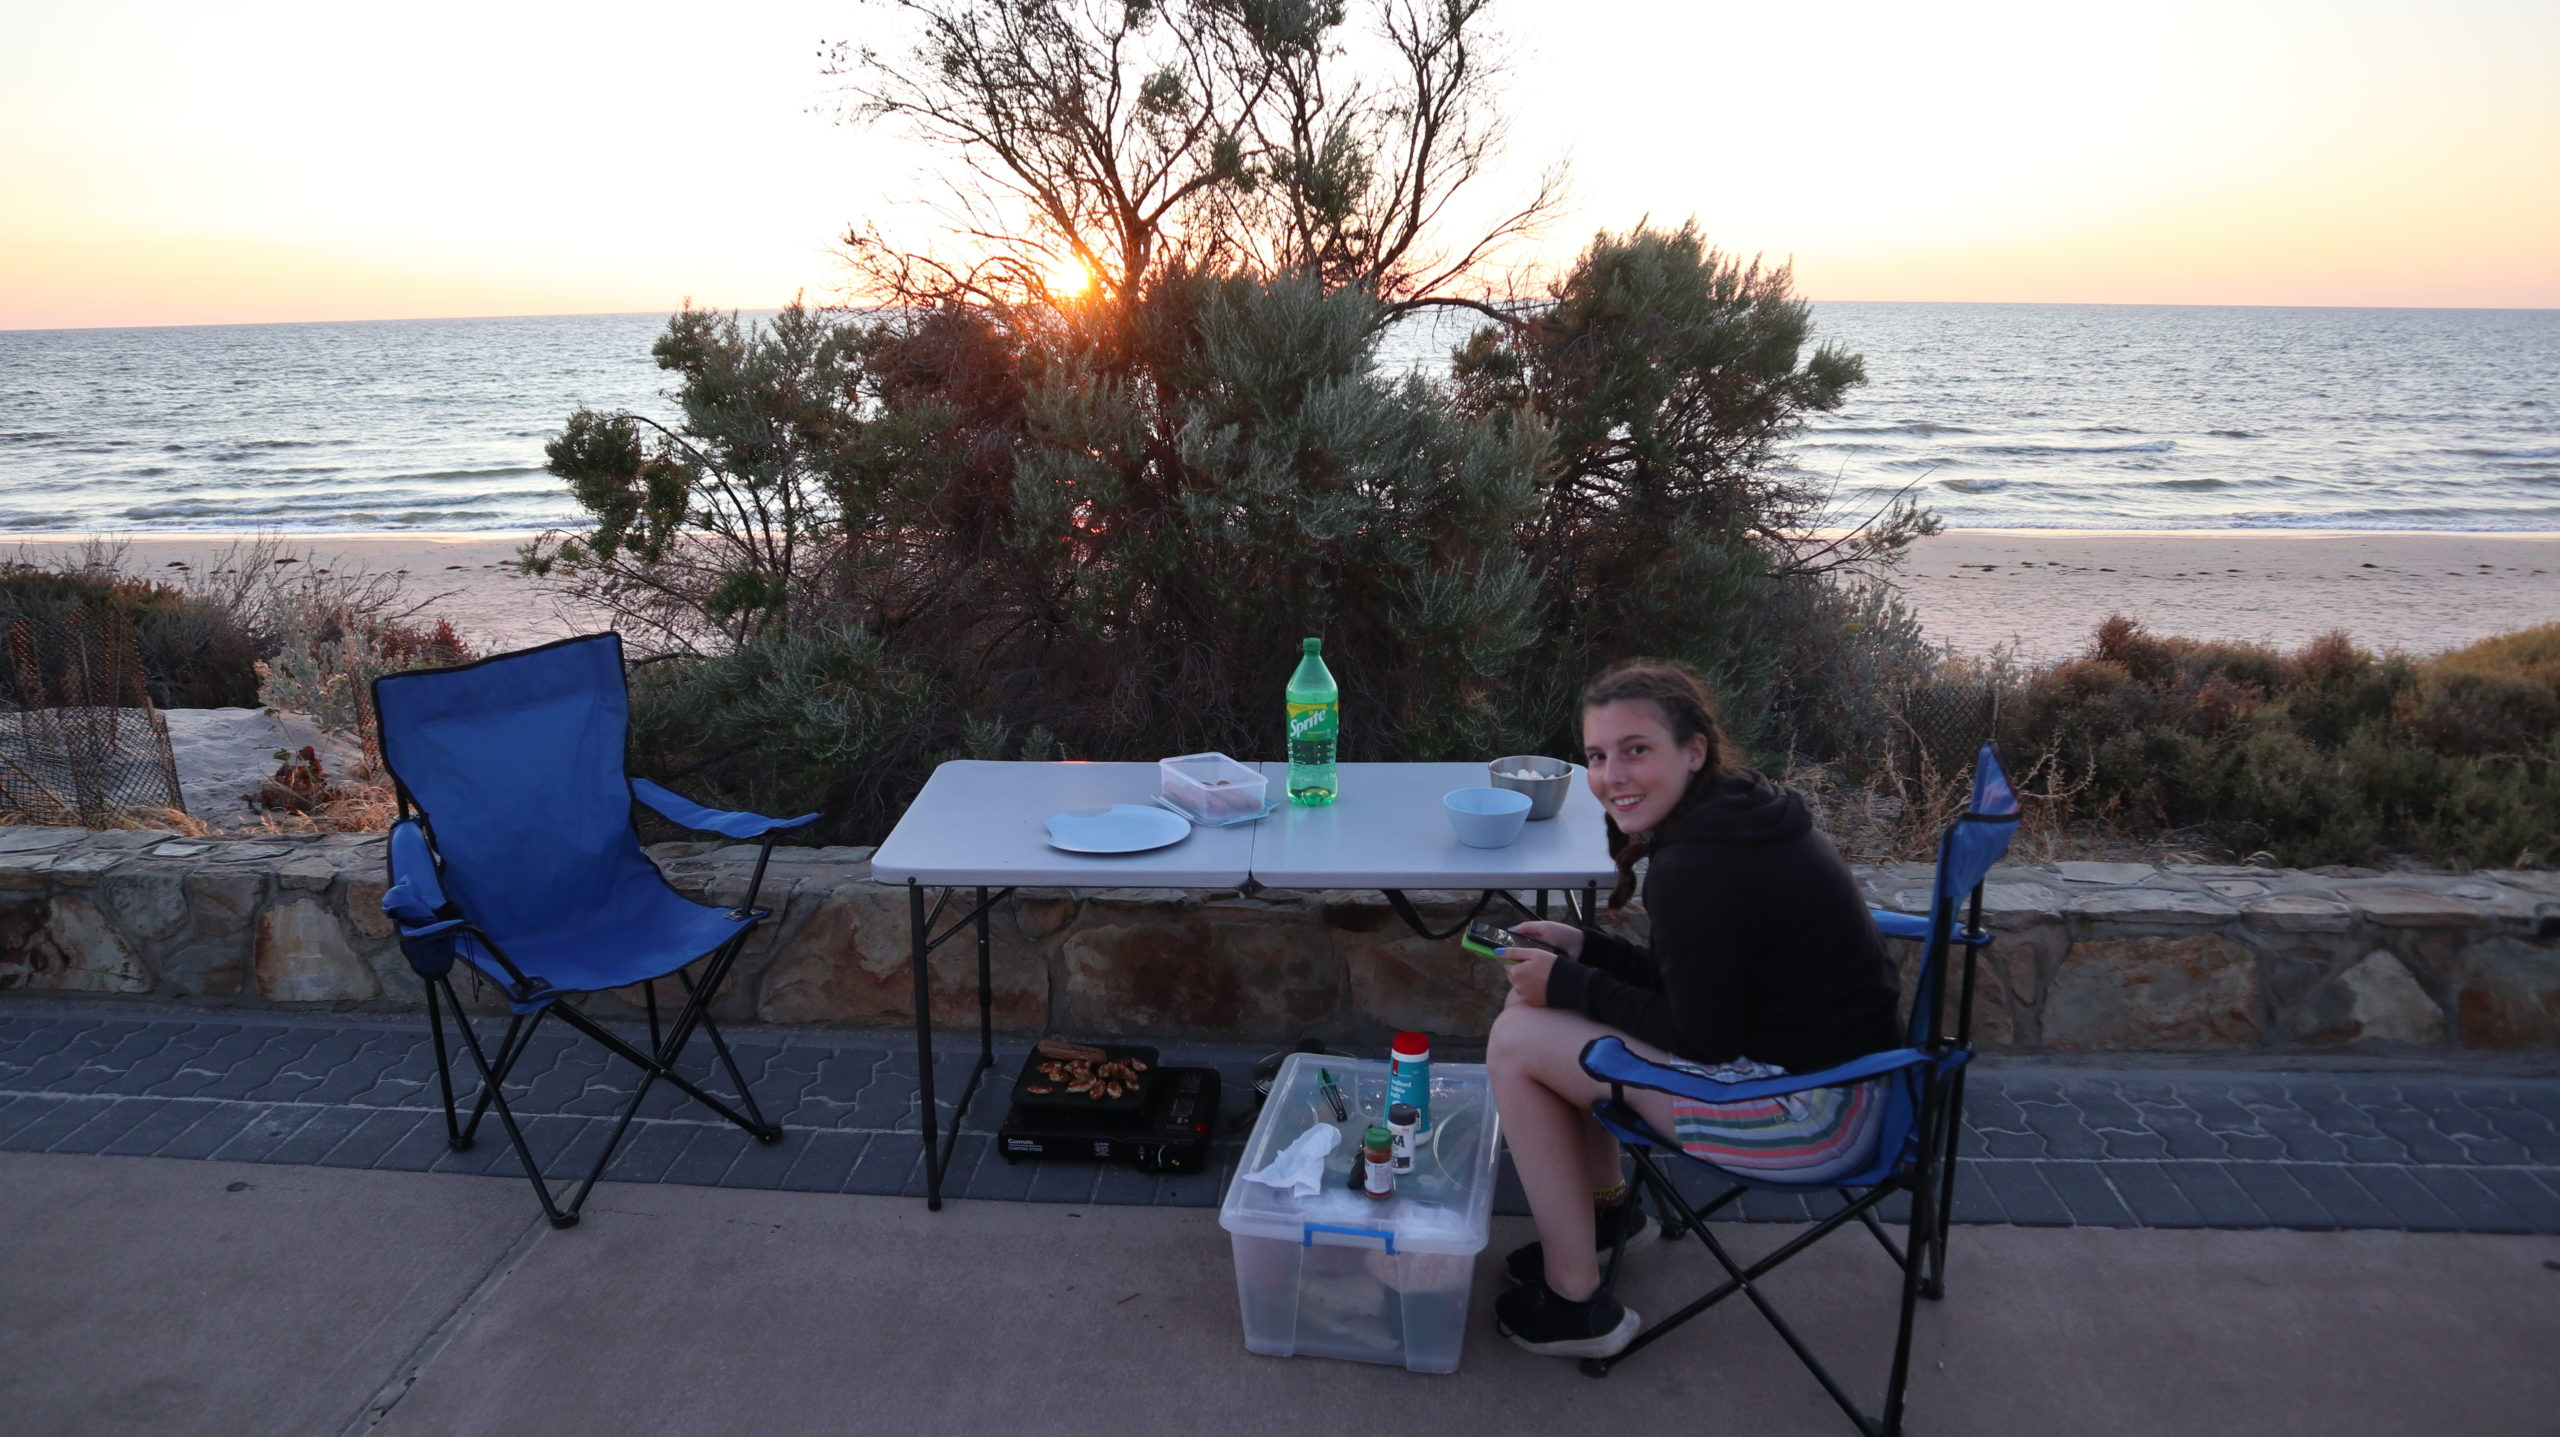 Erste Nacht im Auto: Jenny mit Campingsachen am Strand